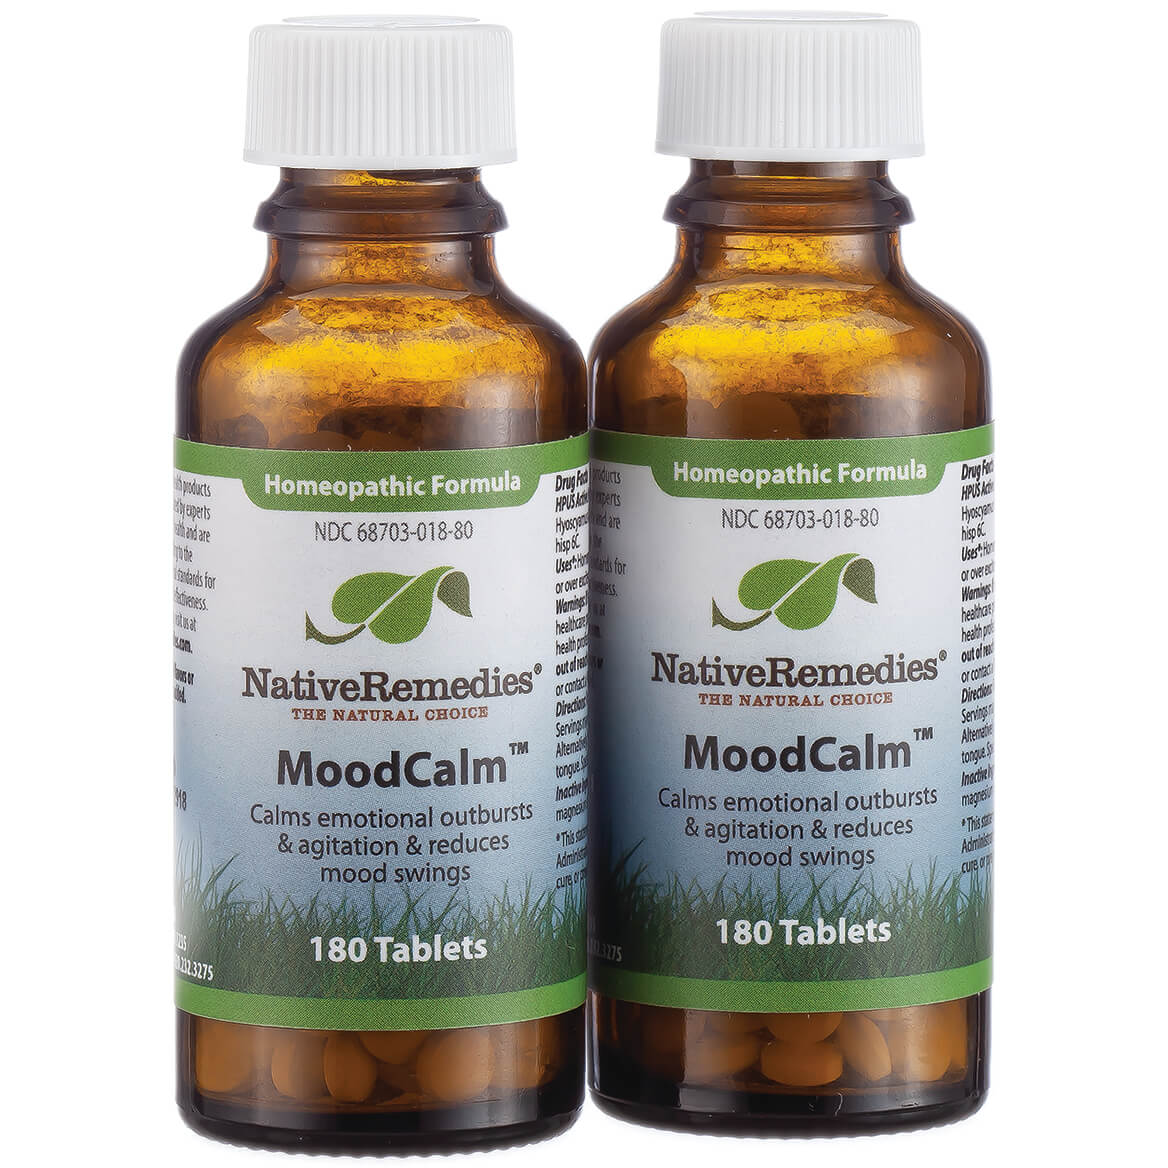 Native Reme S Moodcalm For Emotional Balance Mood